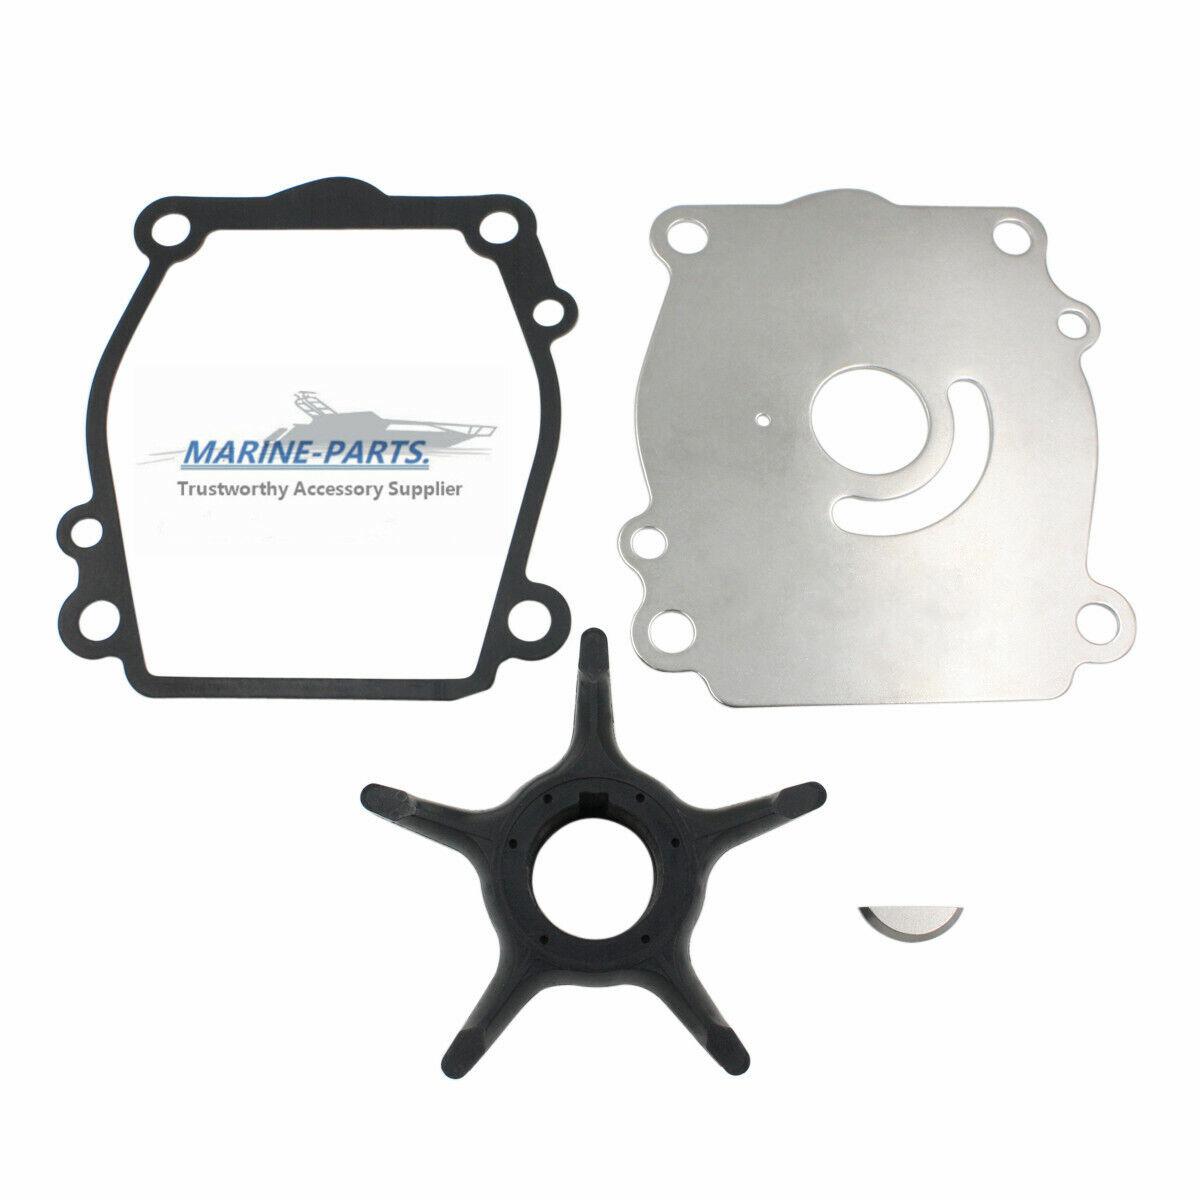 Water Pump Impeller Kits 17400-98551 replacement for SUZUKI Marine